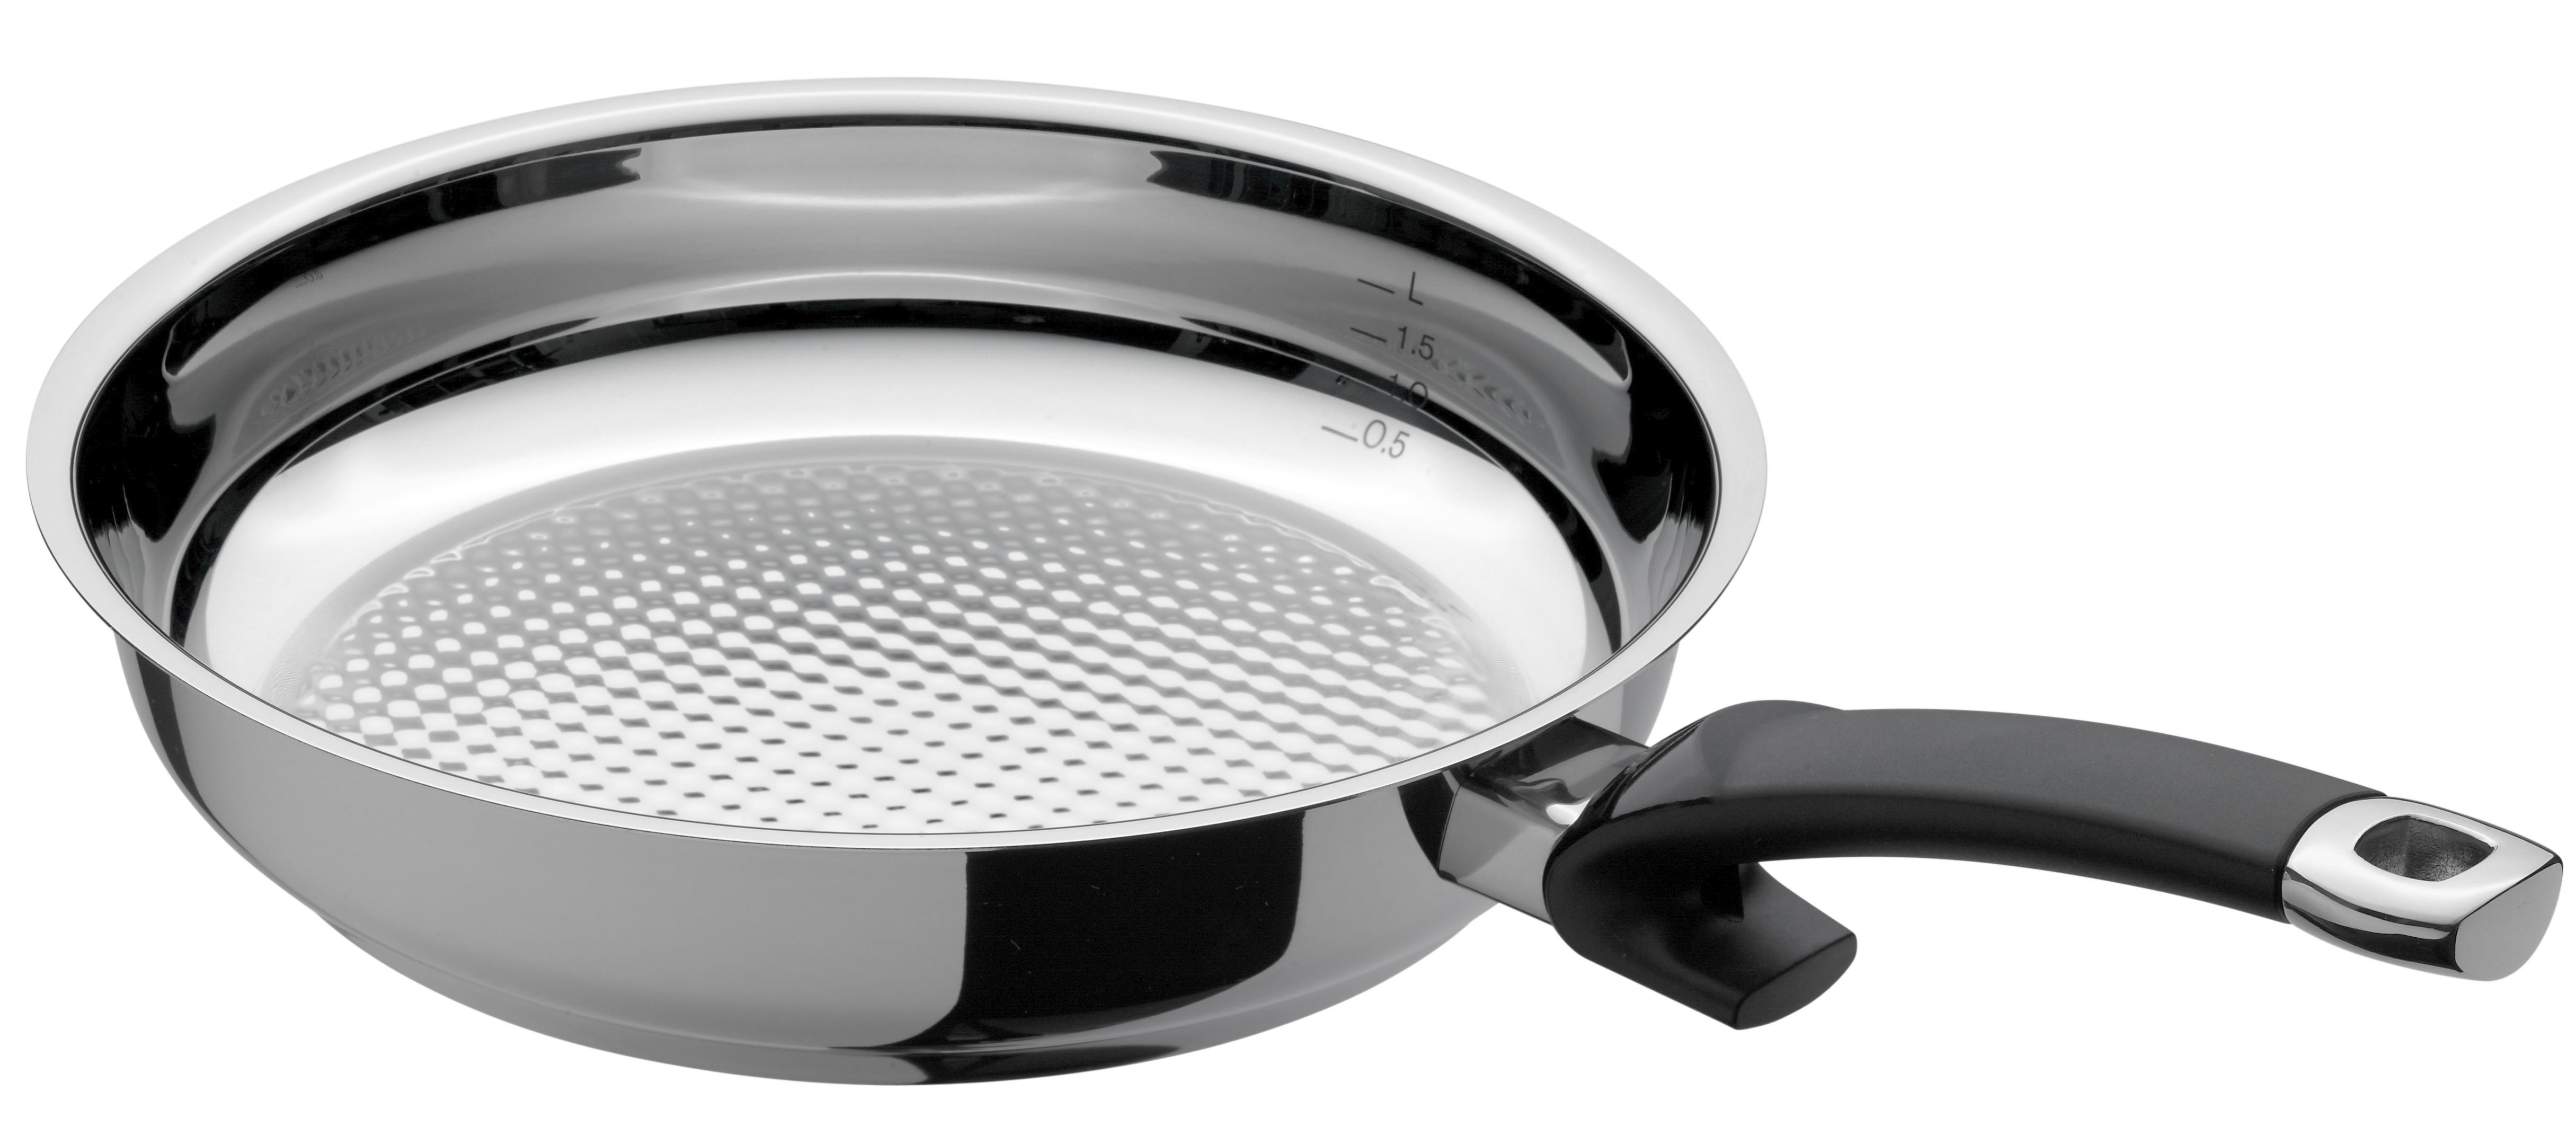 Fissler Crispy Steelux Comfort Stainless Steel Frypan, 11 Inch